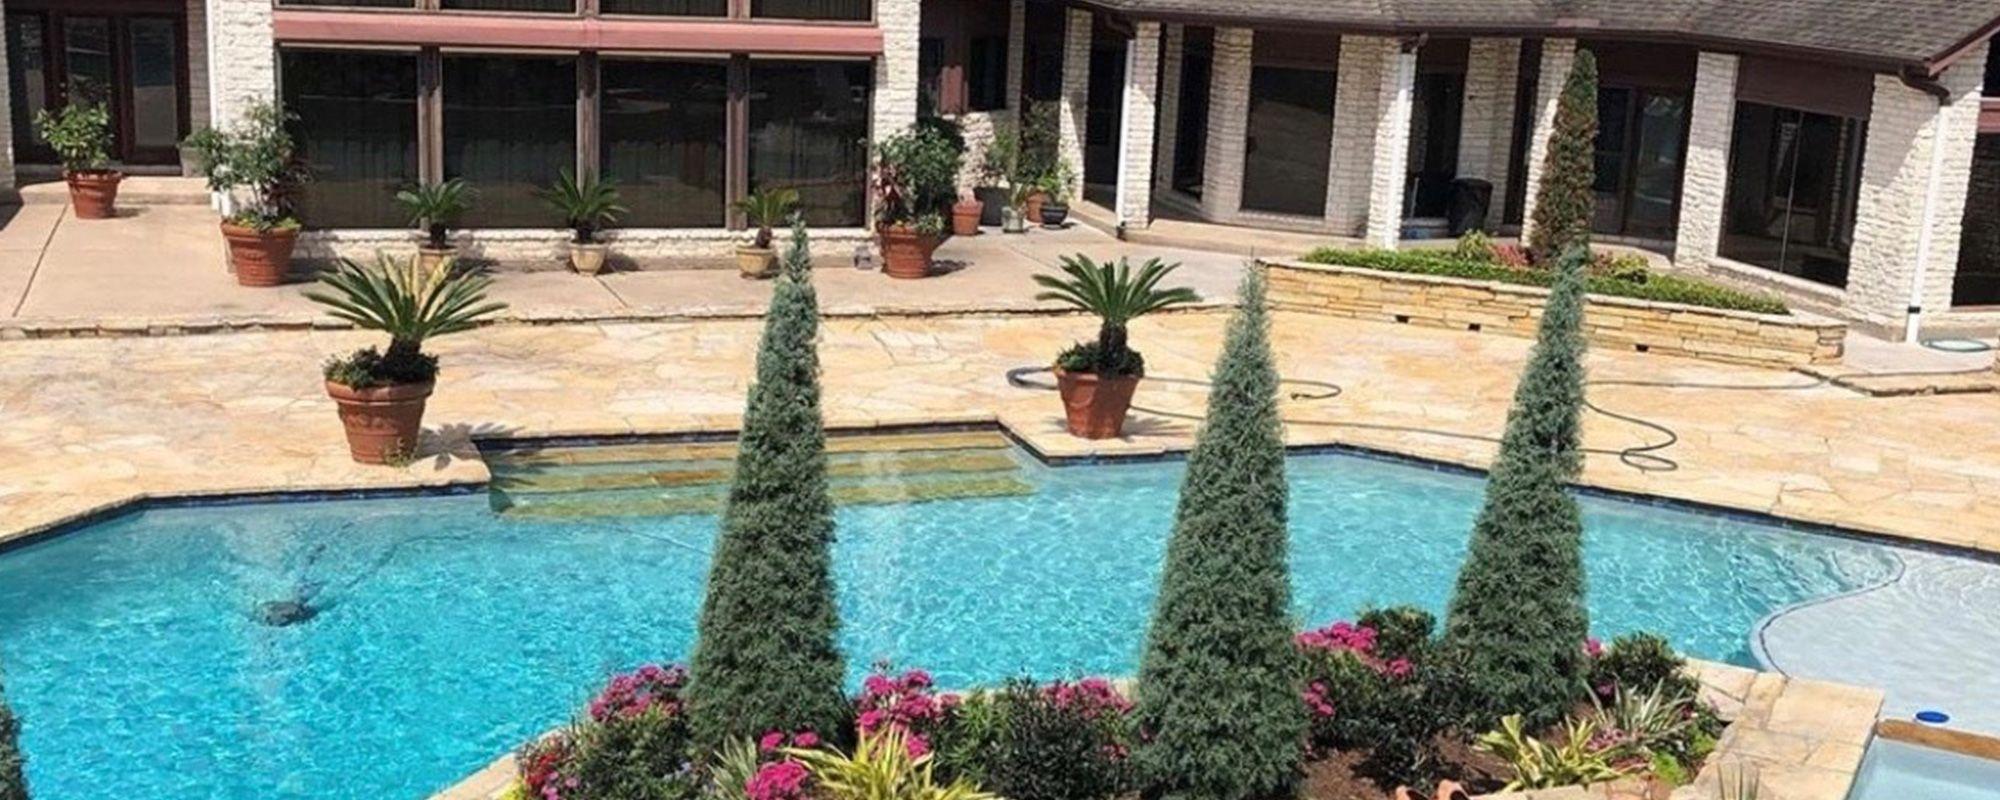 pool decking.jpg